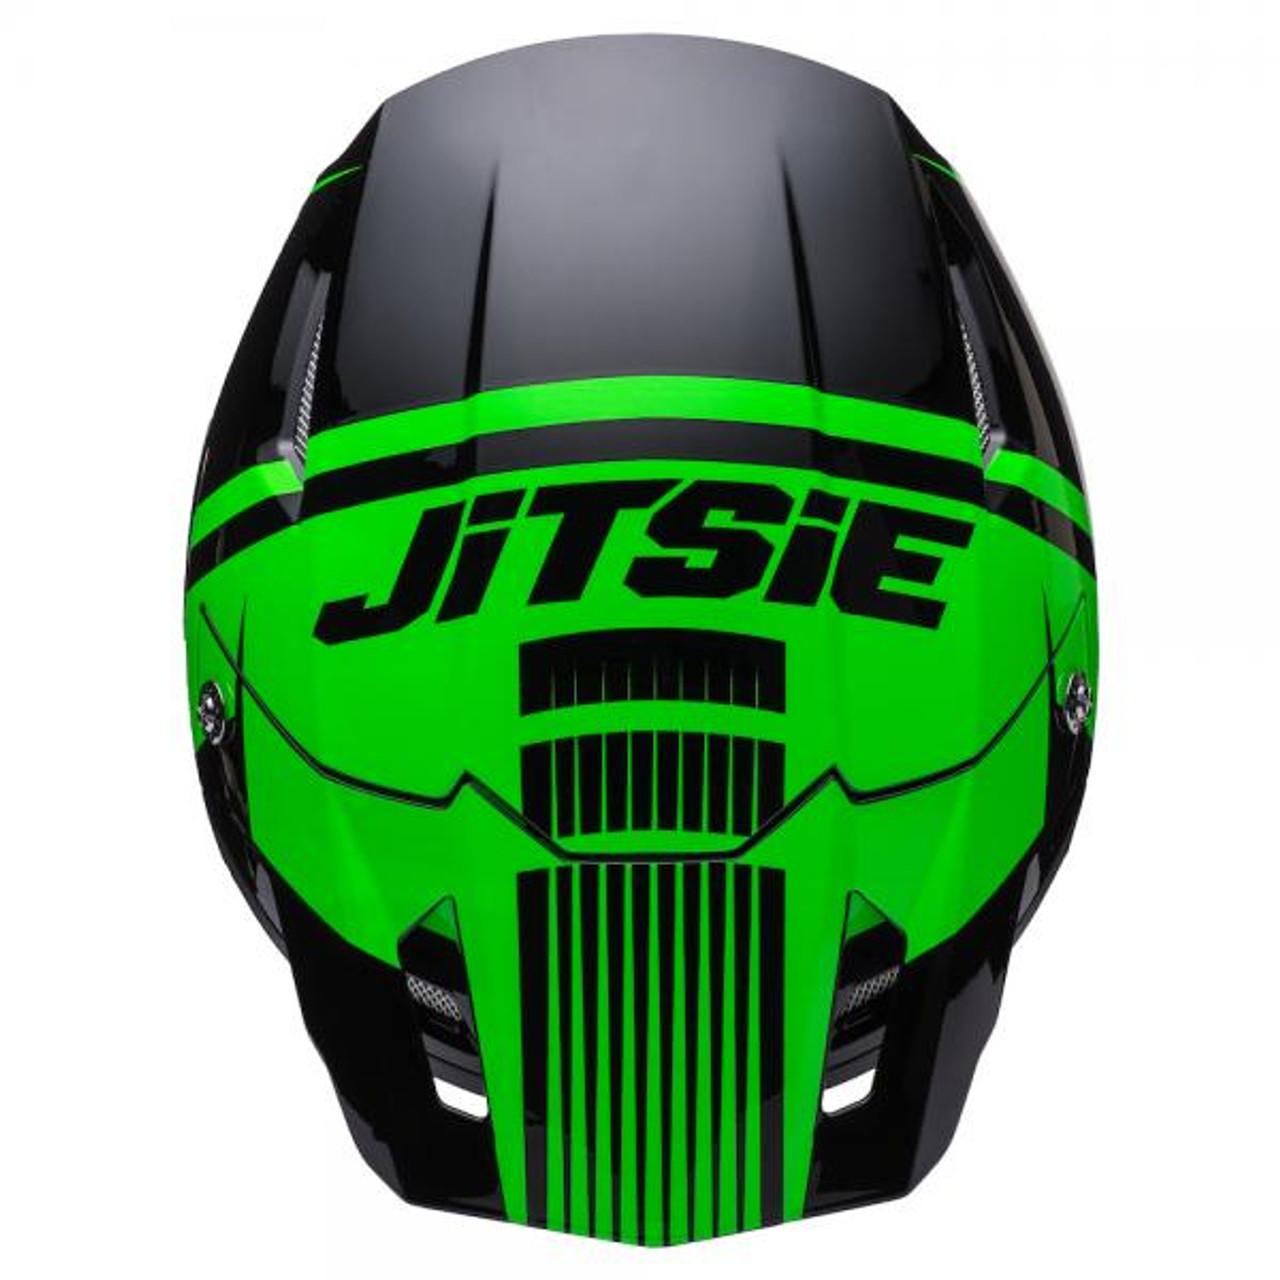 Helmet HT1 Struktur, black/ fluo green